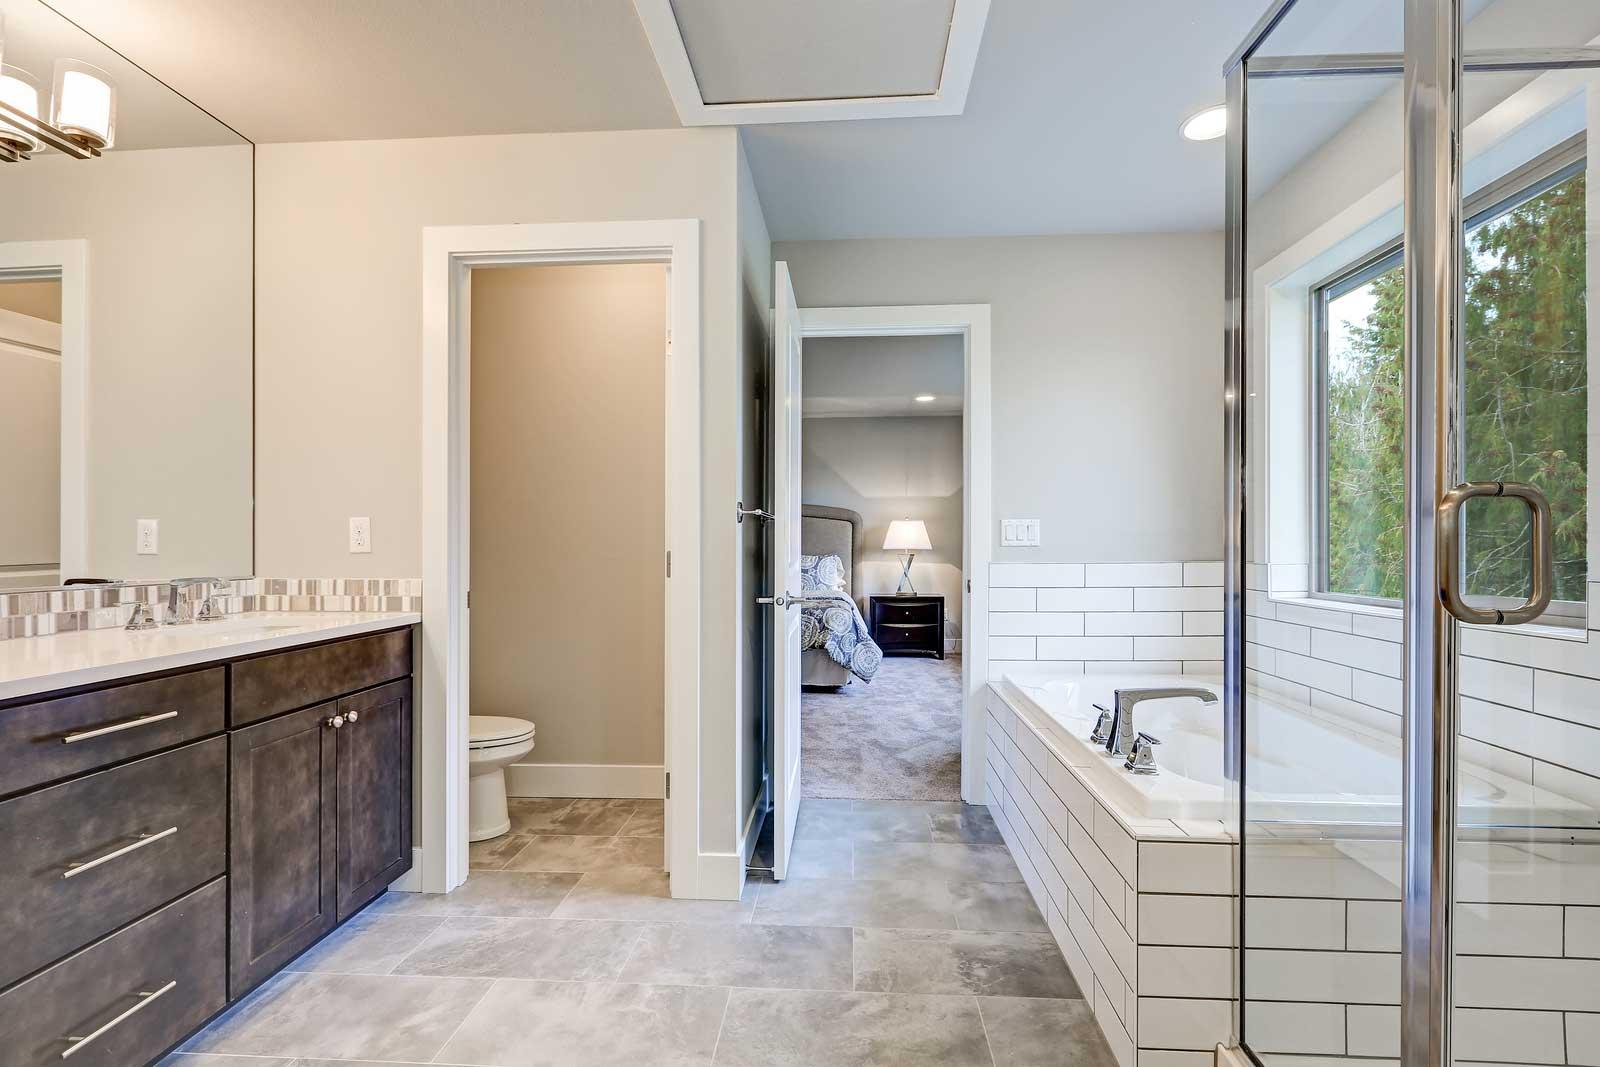 Bathroom Remodel Zionsville | Expert Bathroom Remodeling on Restroom Renovation  id=71280